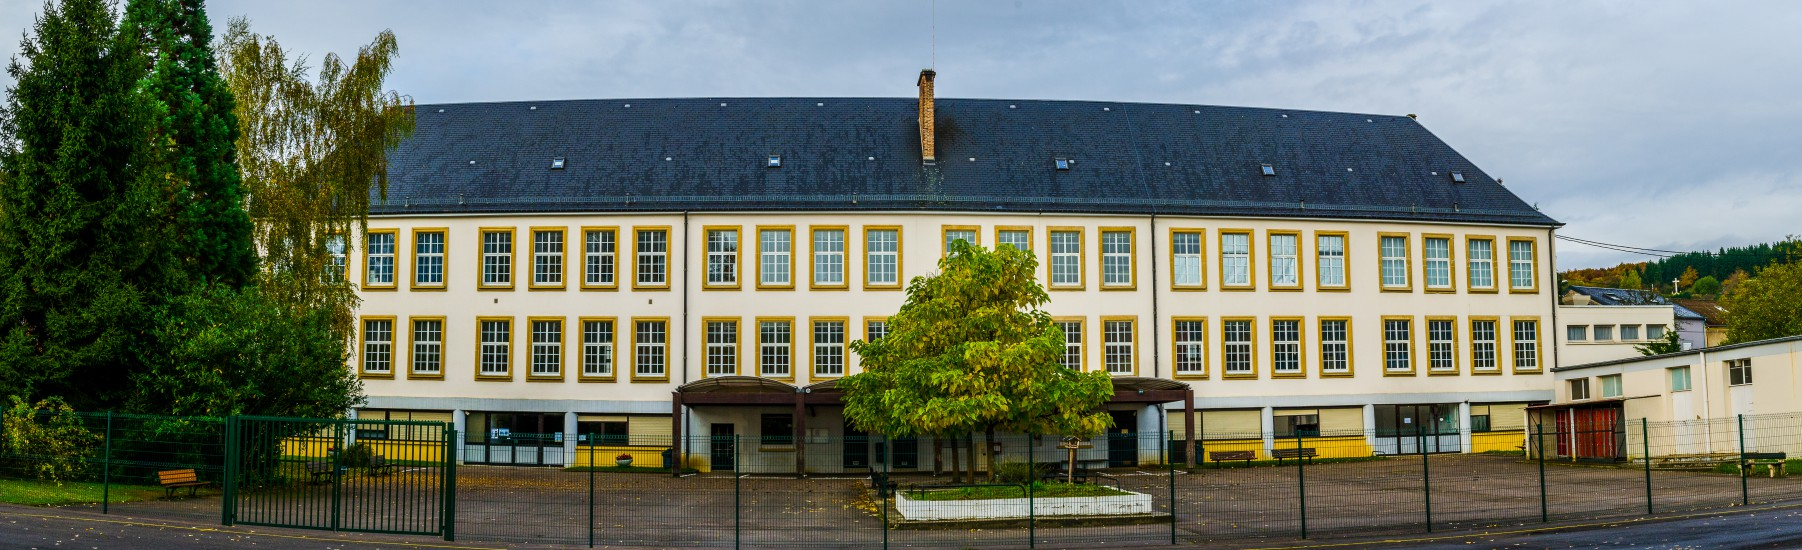 Collège Jean Marie Pelt Volmerange-Les-Mines